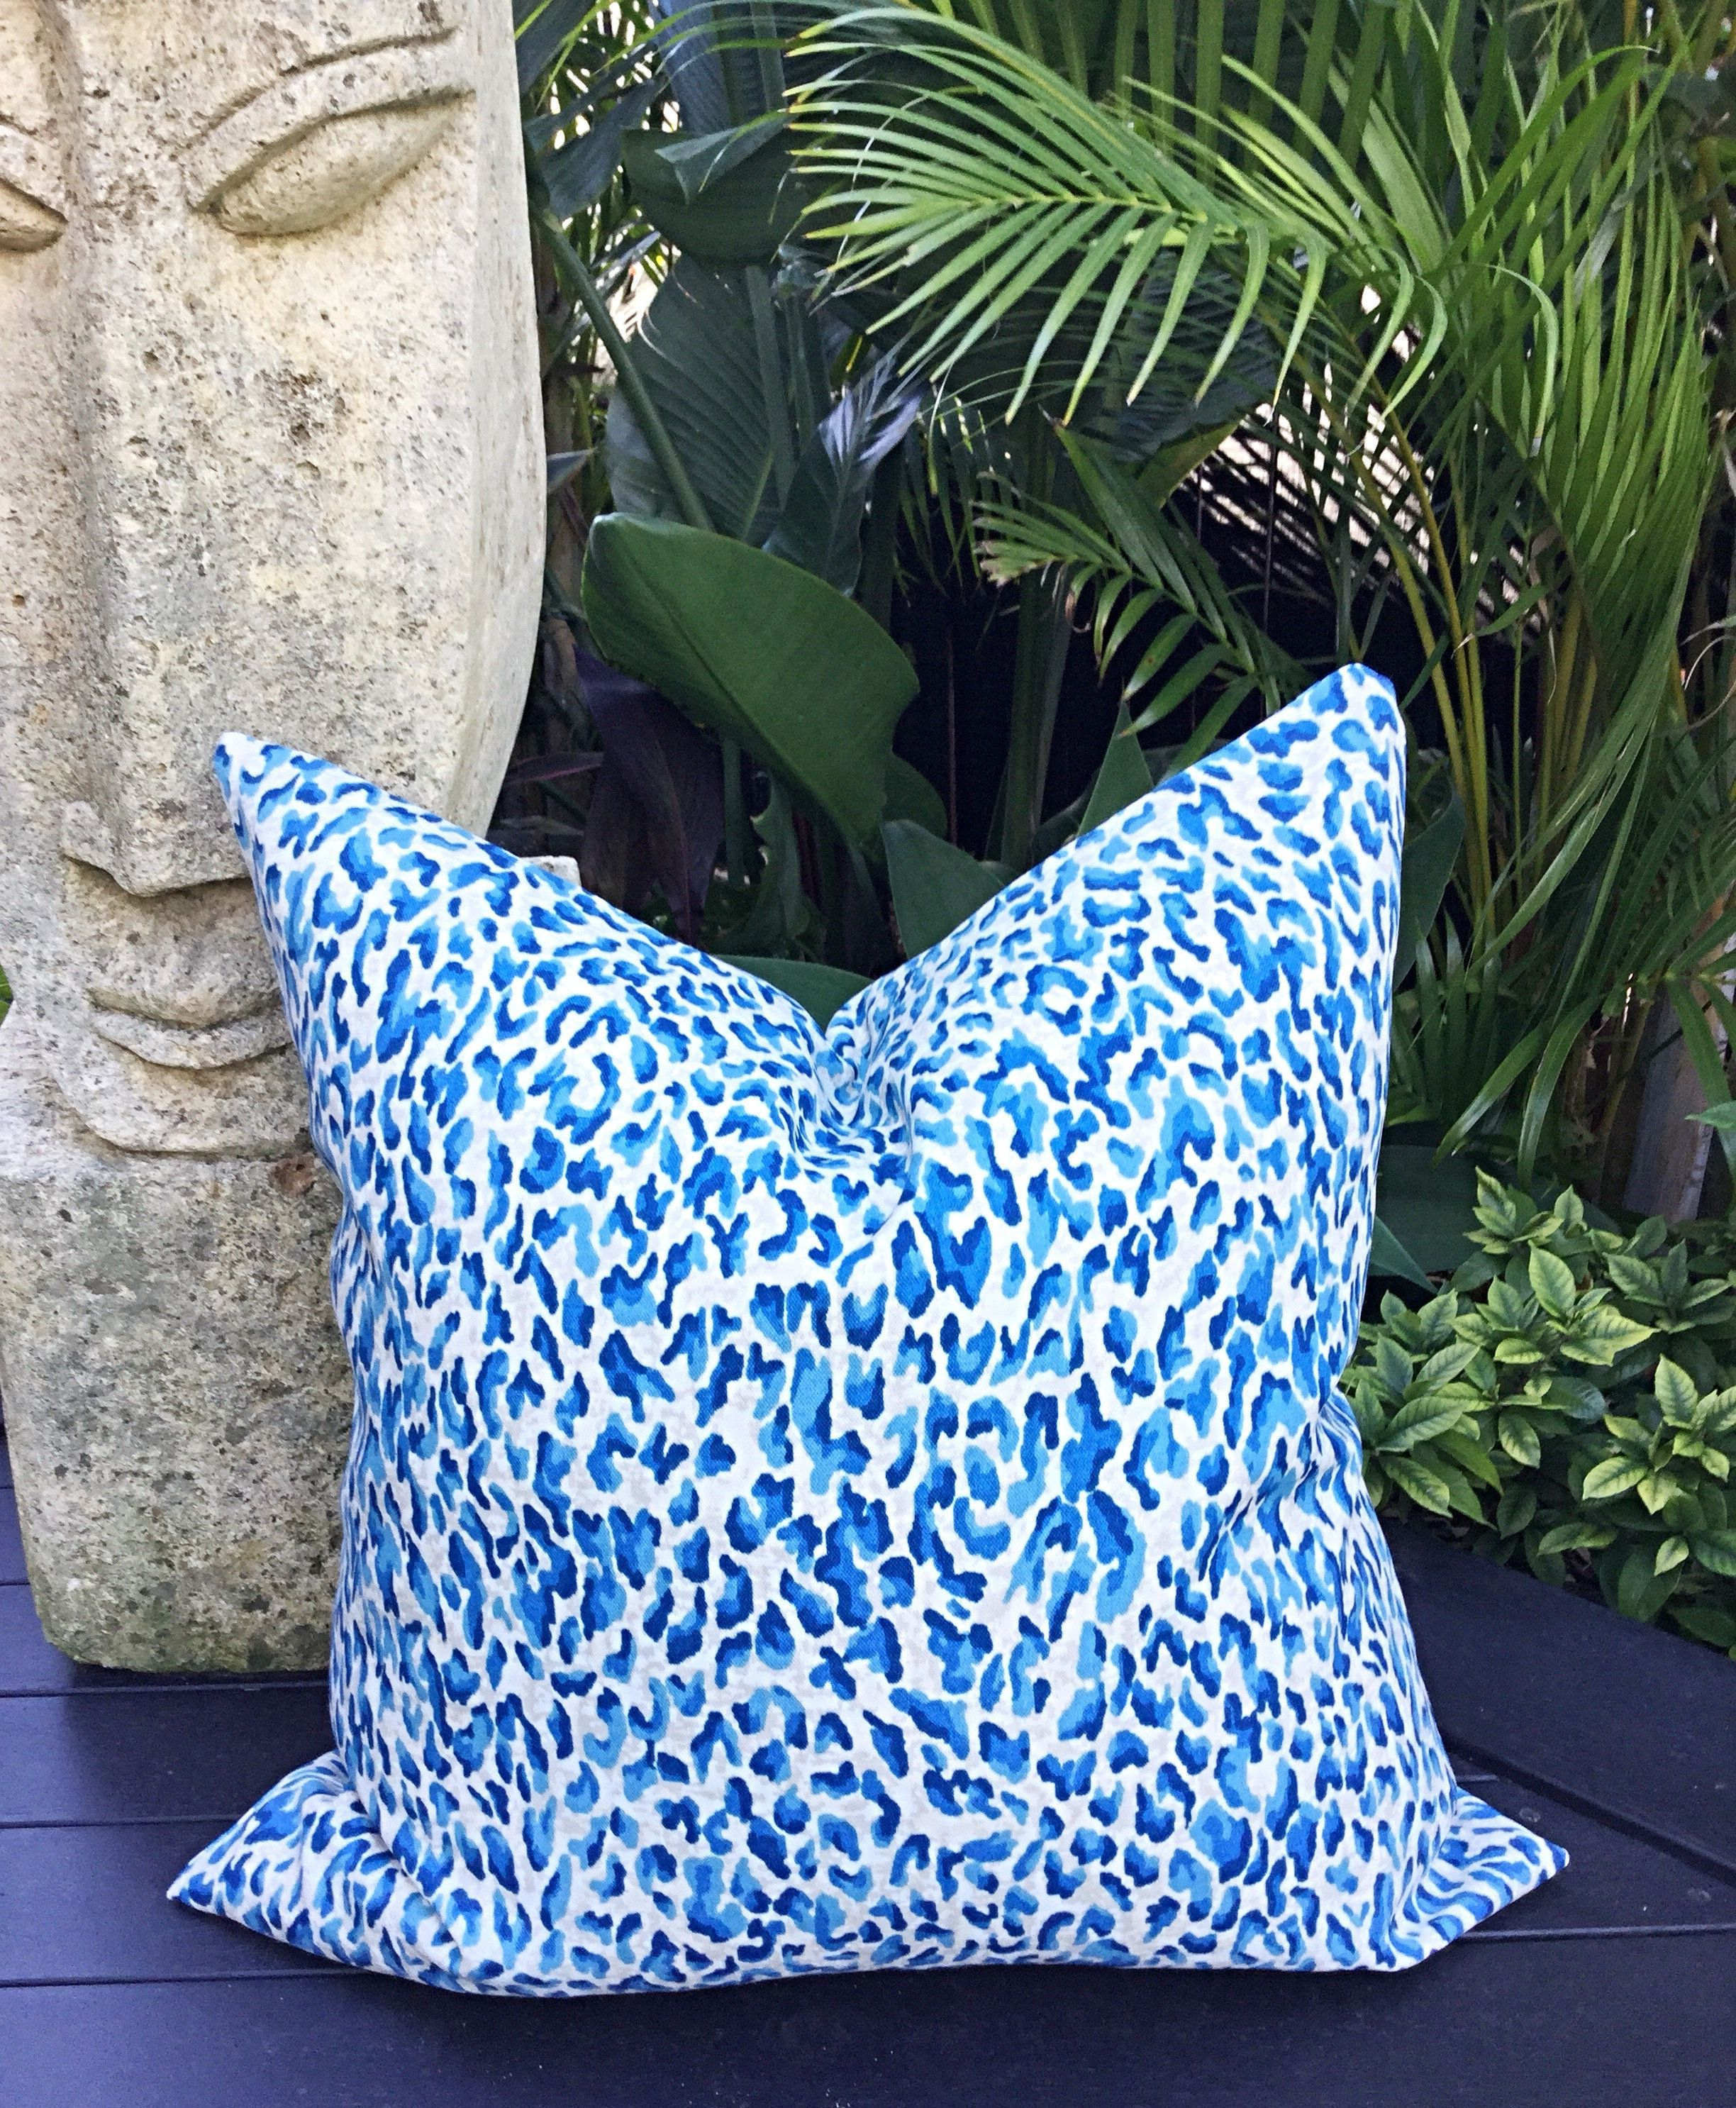 Leopard Print Outdoor Cushions Outdoor Pillows Blue Grey Cushion